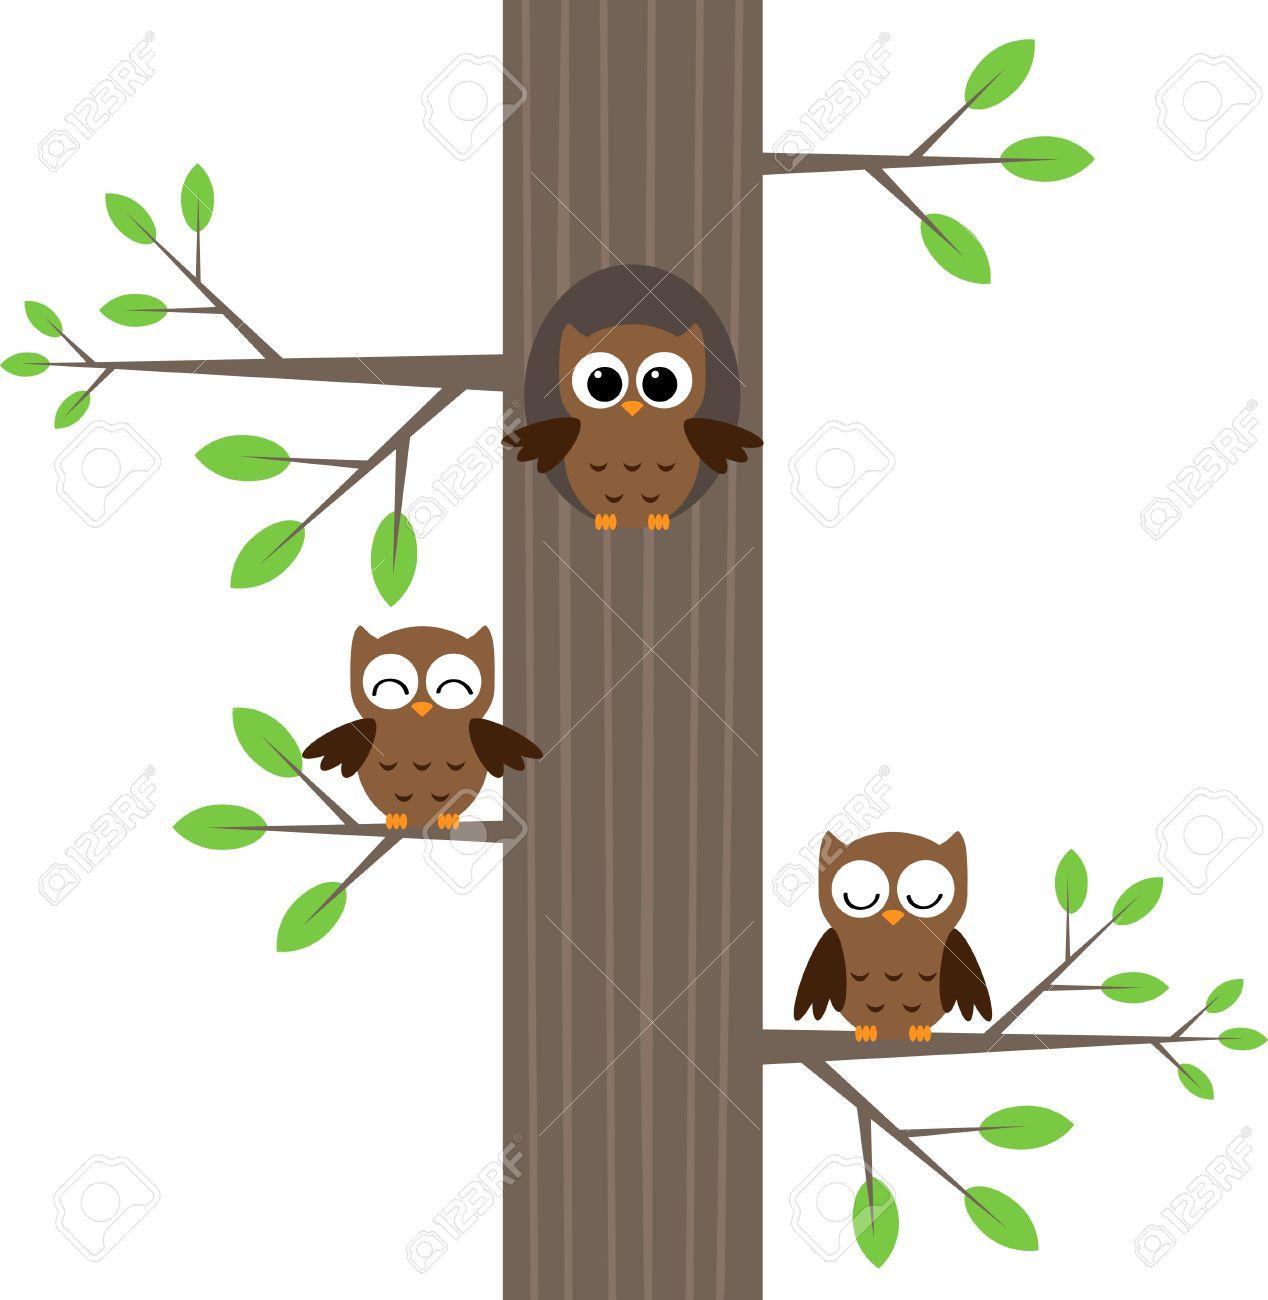 Owl tree stump clipart.